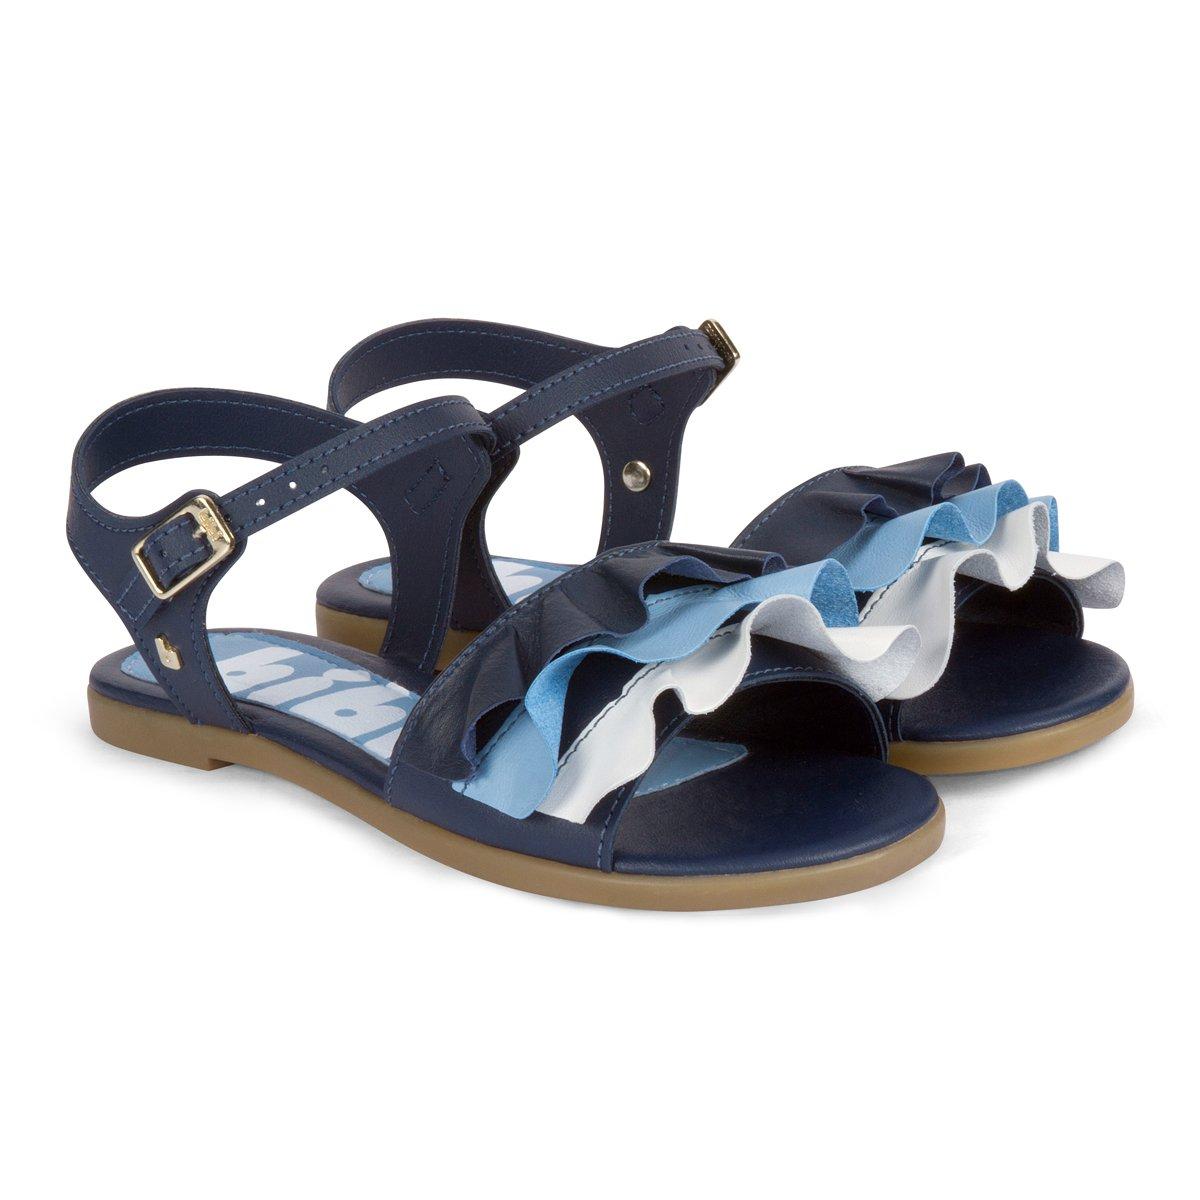 Sandale din piele Bibi Shoes Fresh Naval, Bleumarin